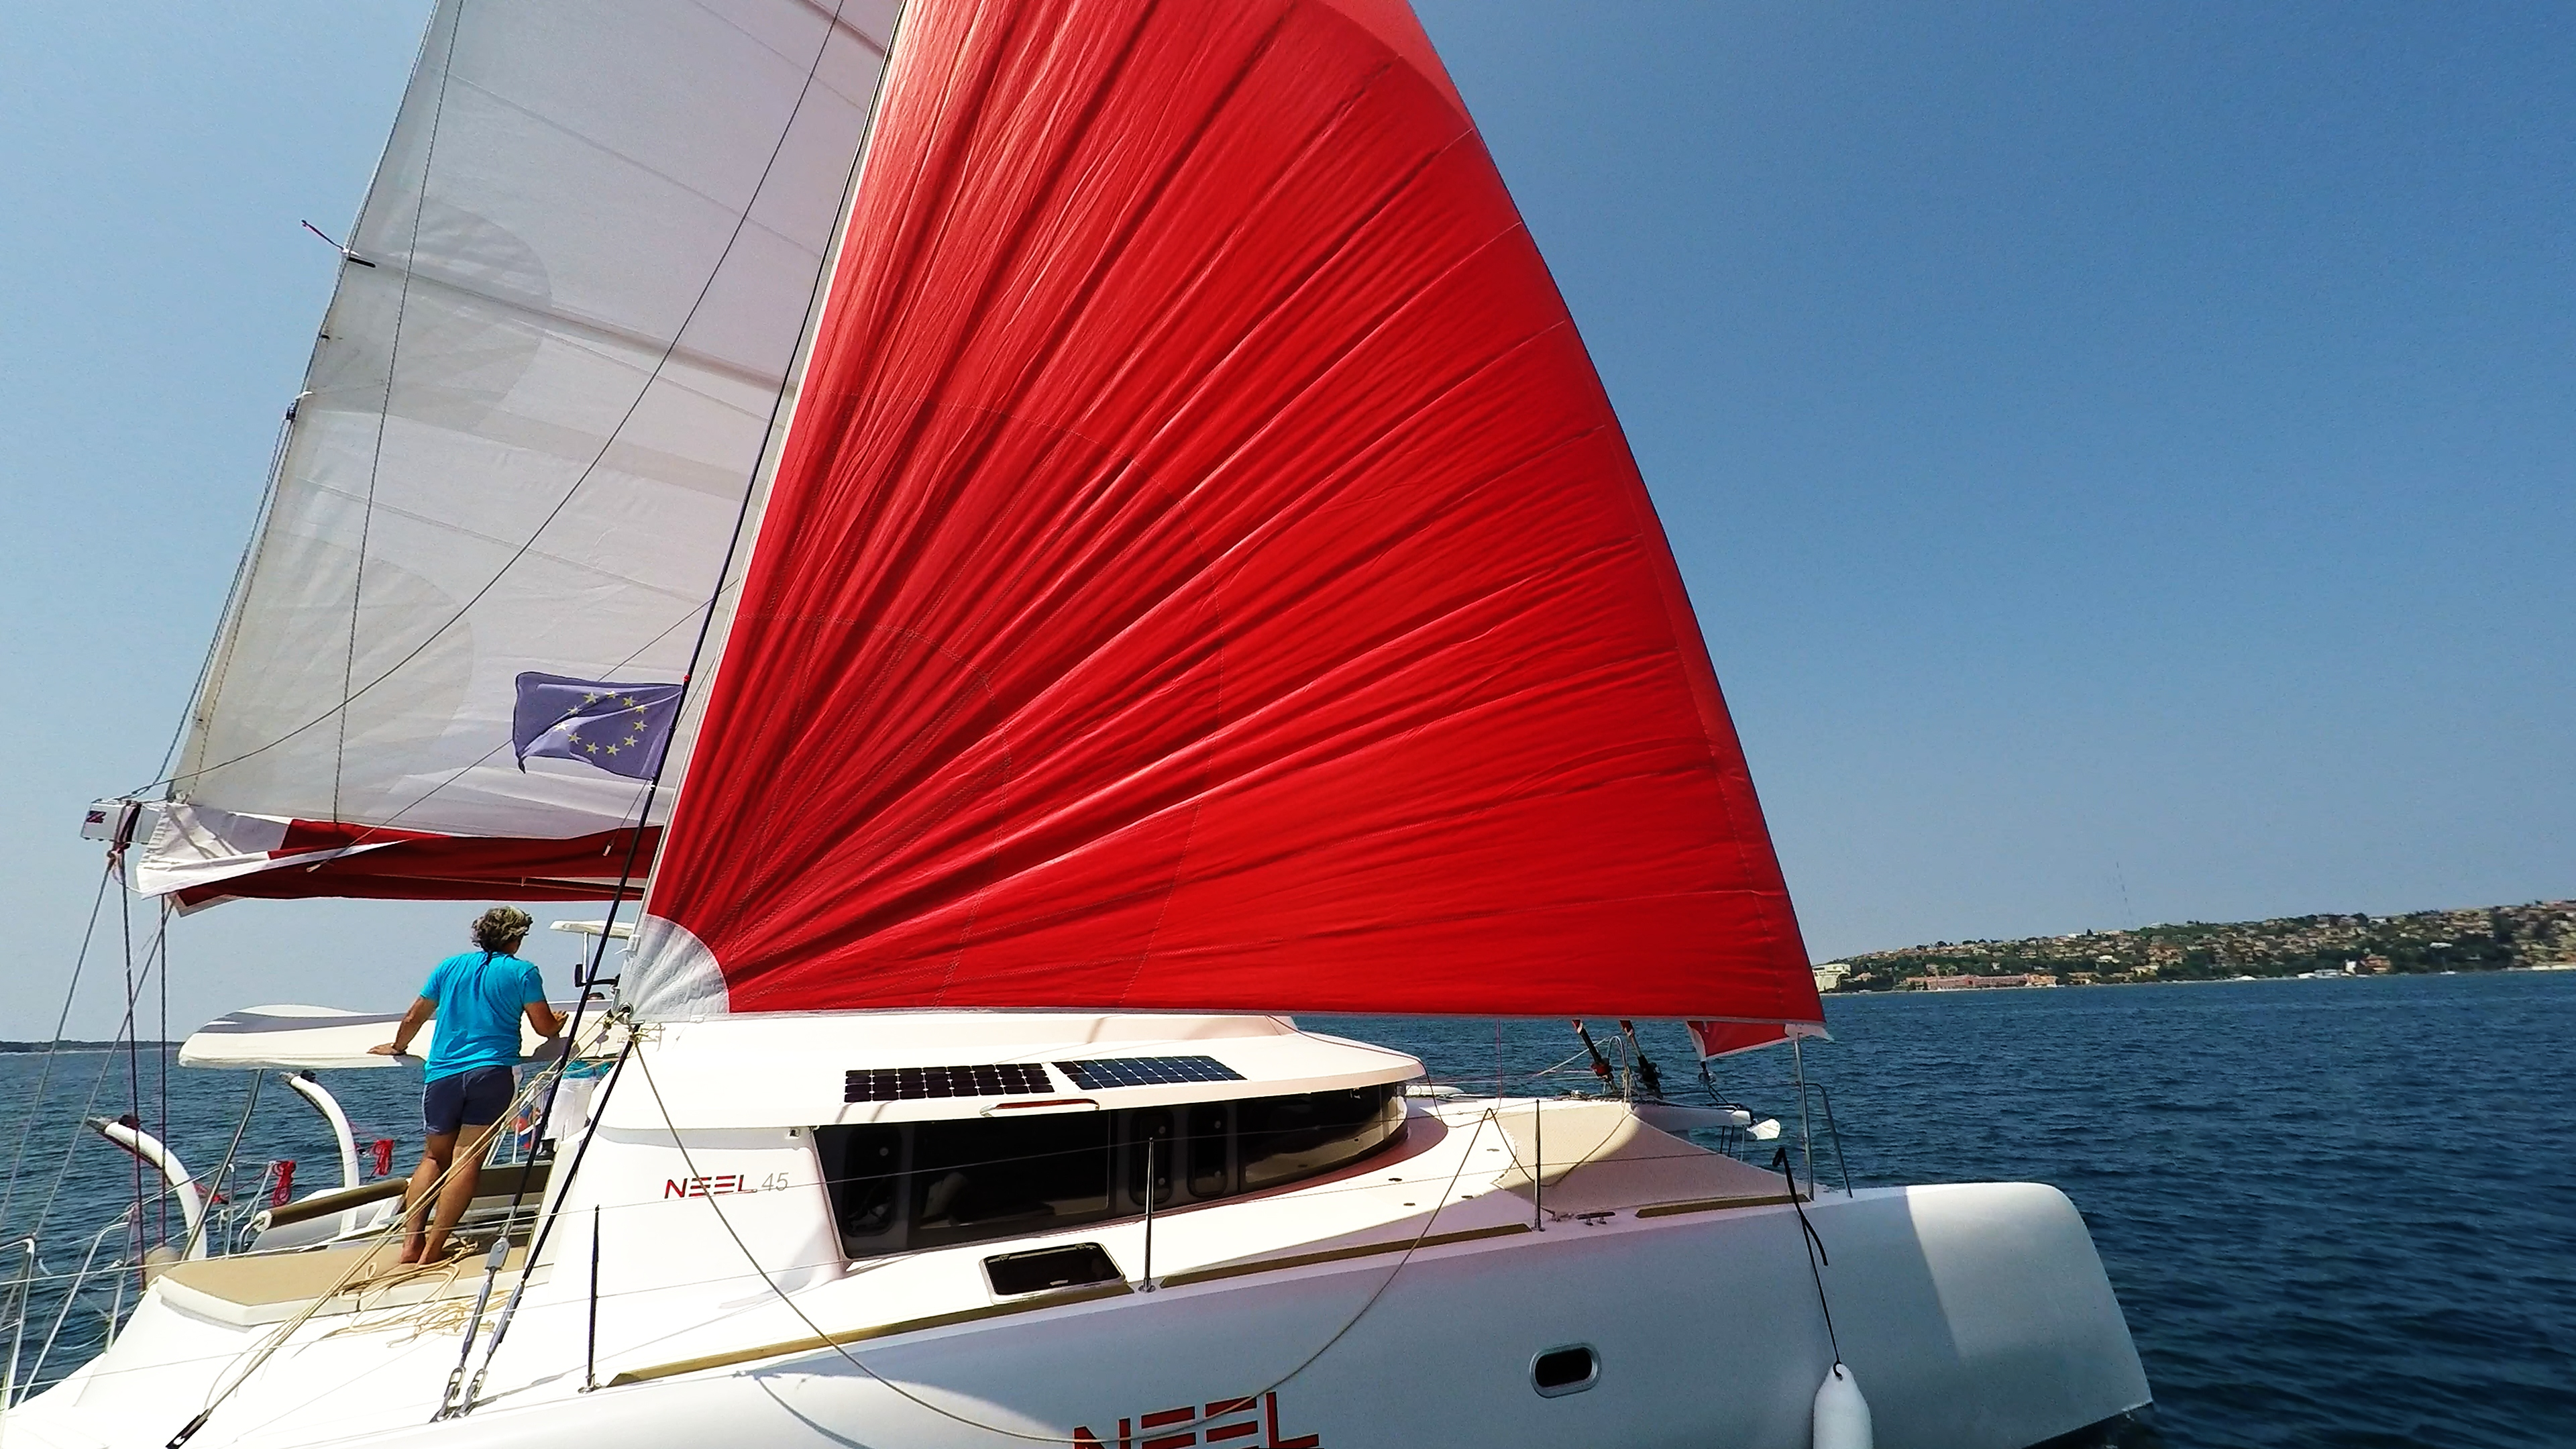 multiscafo yacht neel 45 vela gennaker